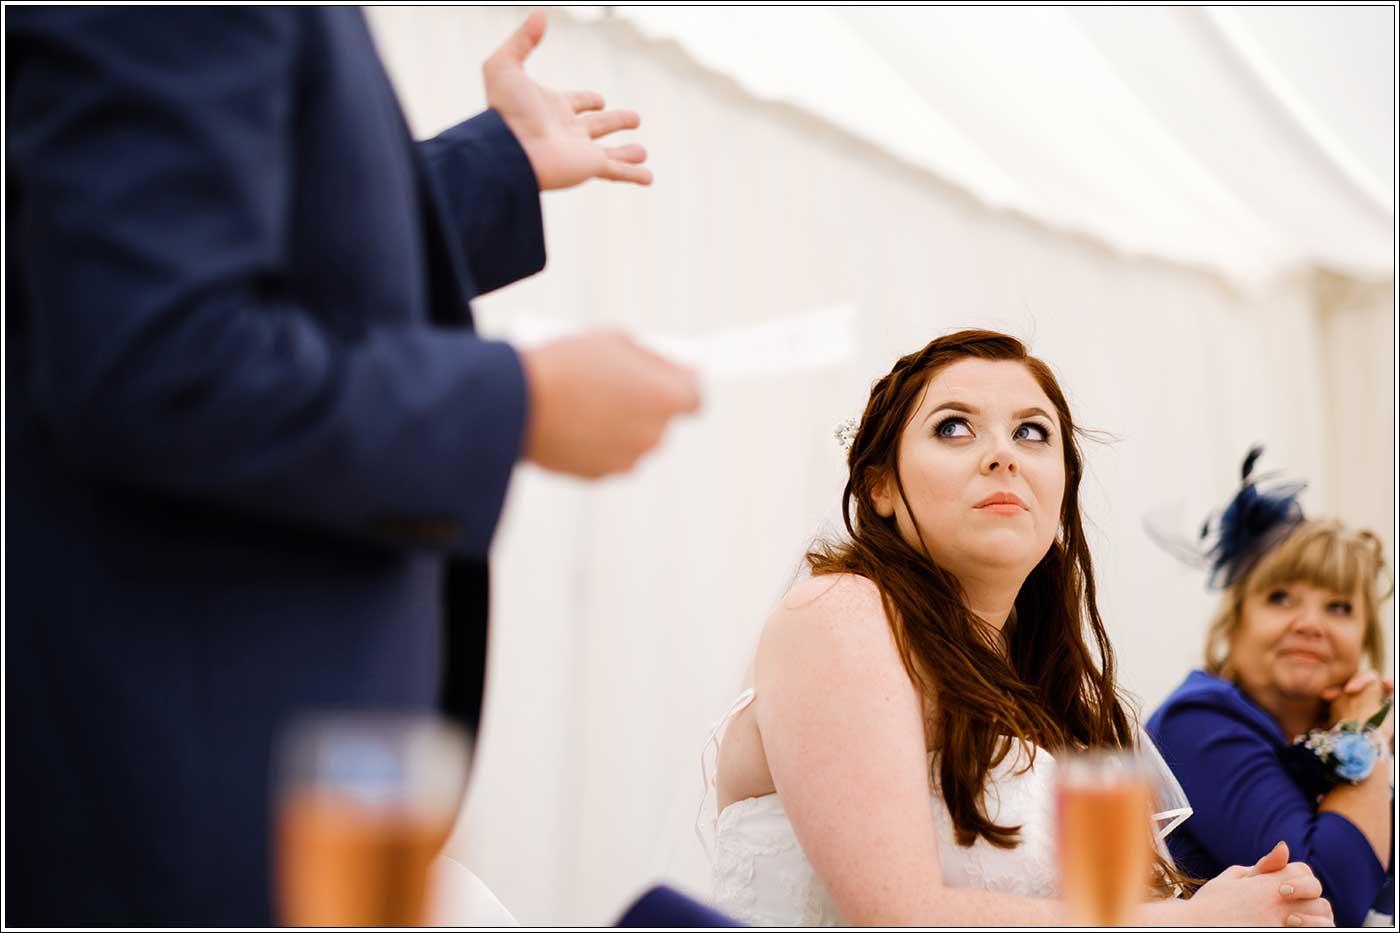 Bride listening to groom's speech